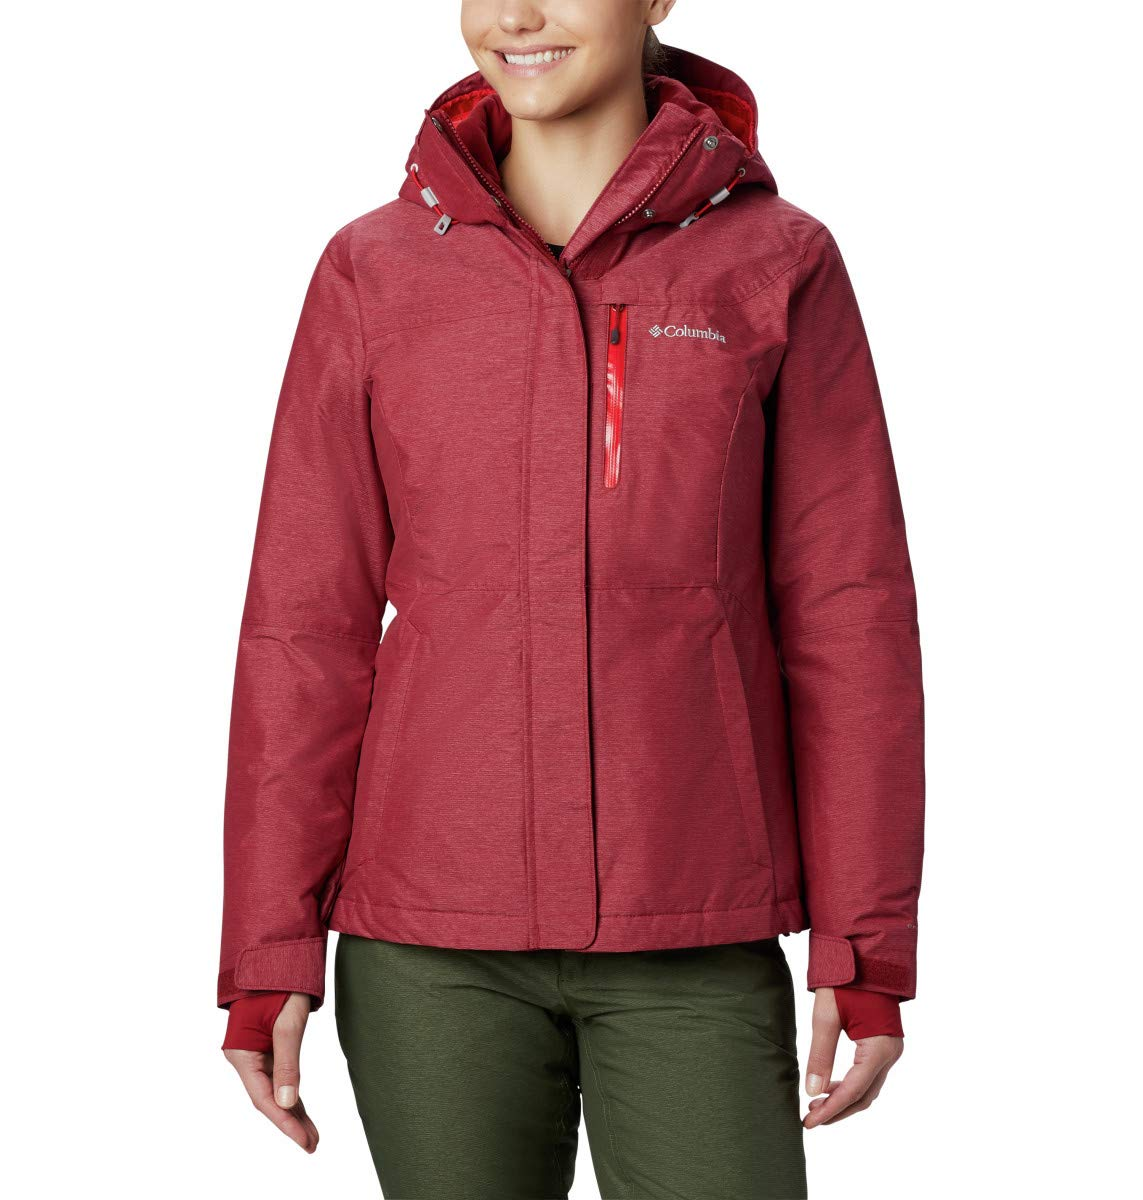 Rot (Beet) XS Columbia Damen Alpine Action Oh' Ski Jacket